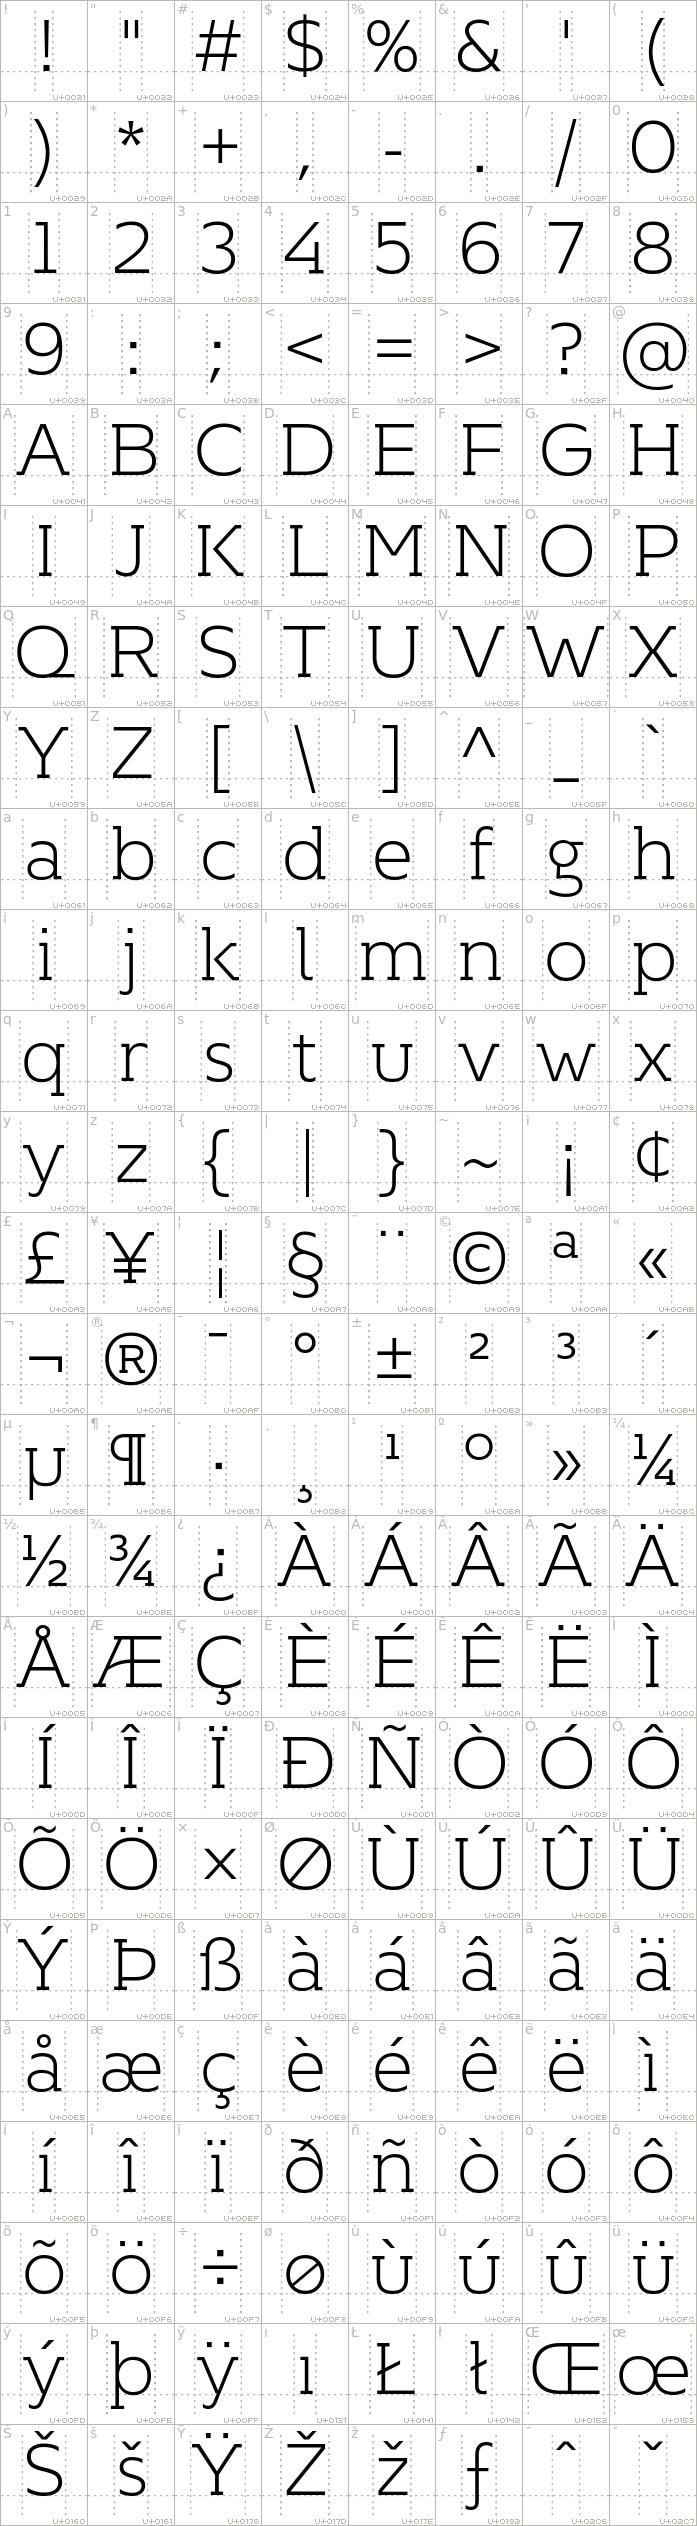 kontrapunkt-bob.light.character-map-1